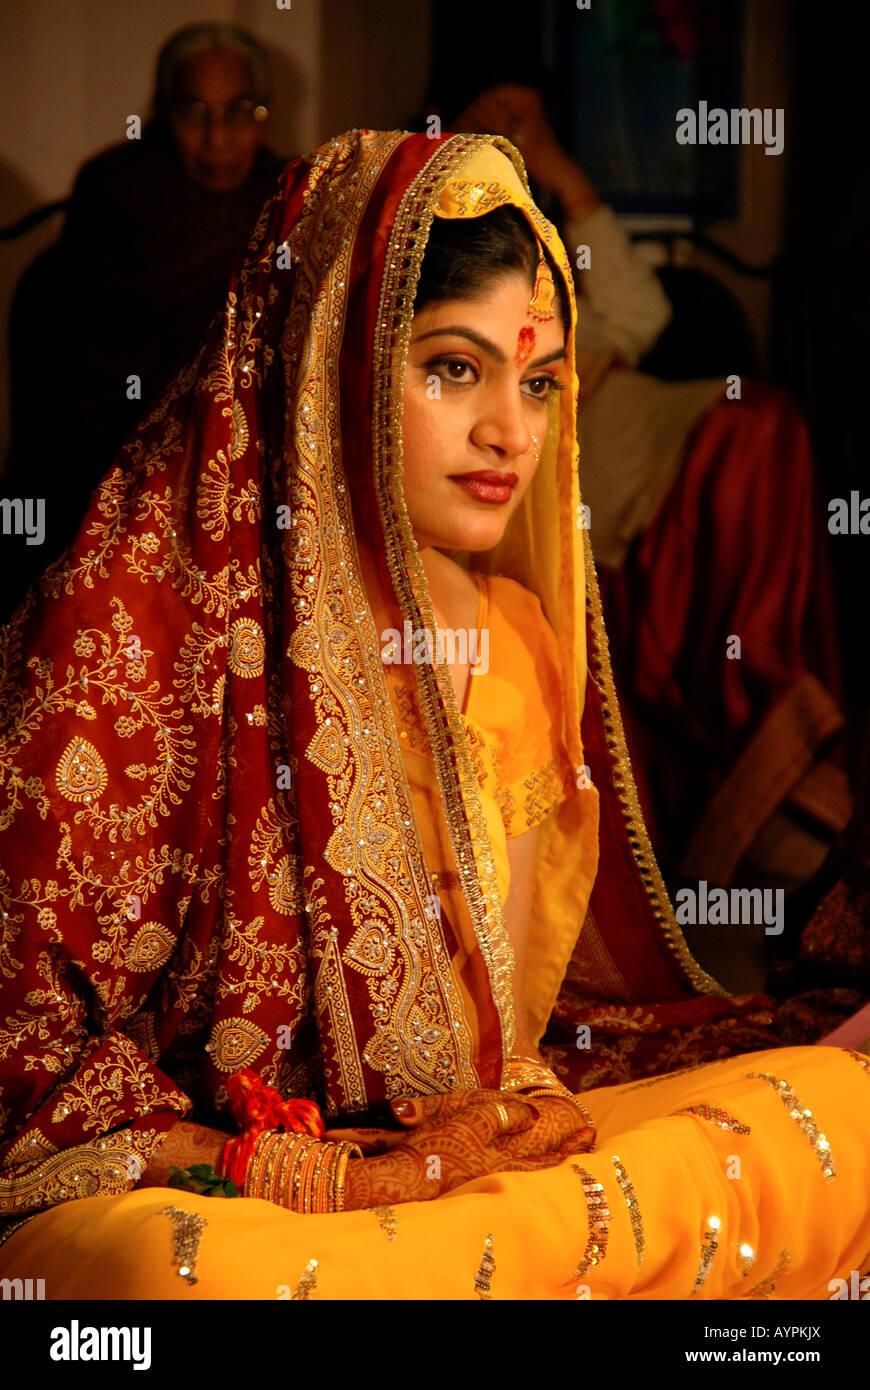 Hindi Wedding Stock Photos & Hindi Wedding Stock Images - Alamy